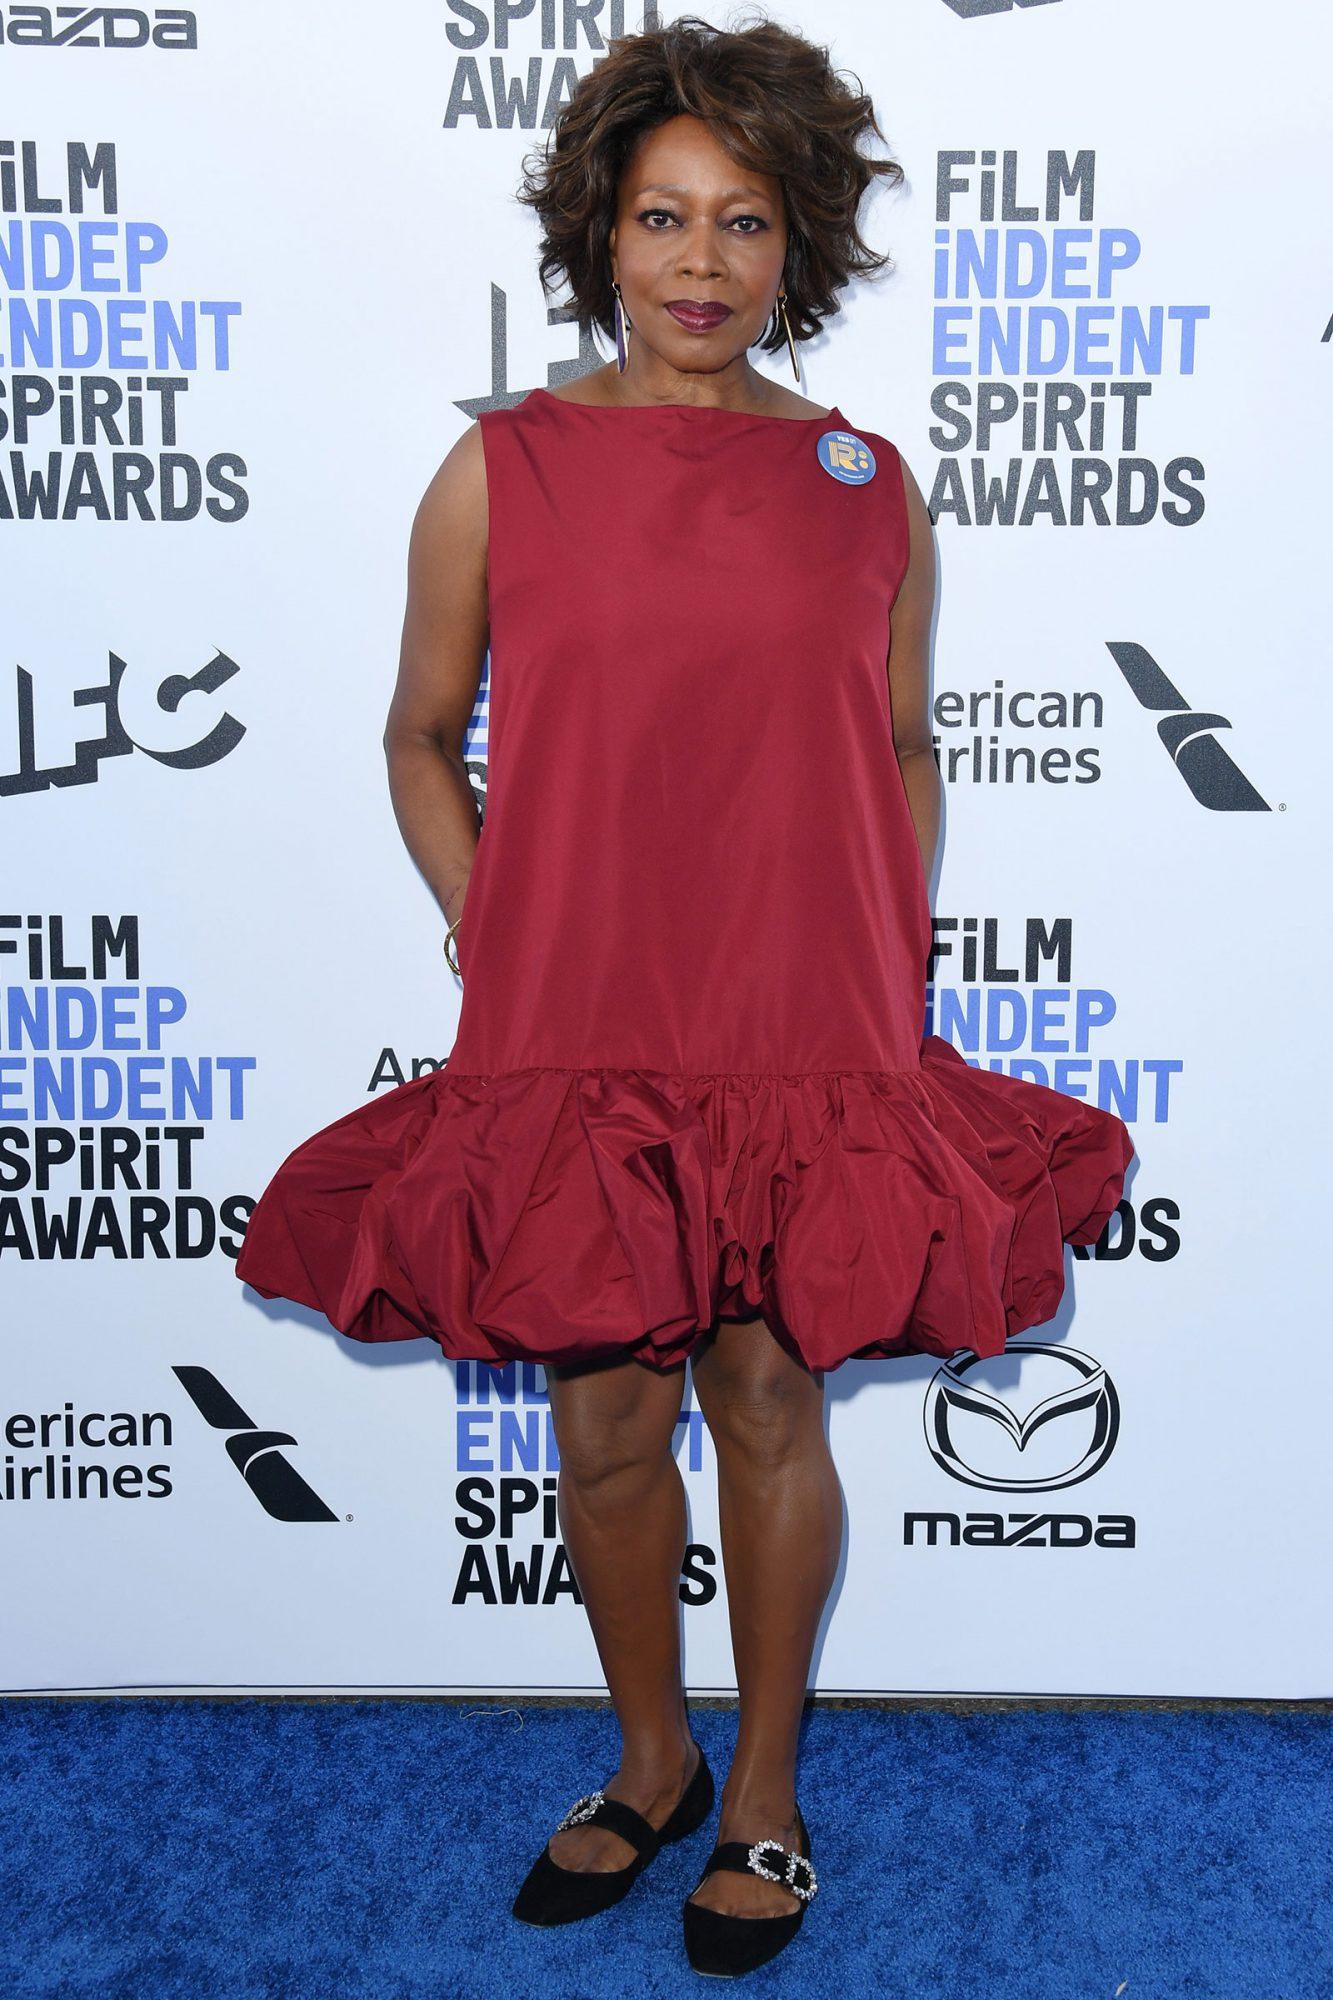 2020 Film Independent Spirit Awards  - Arrivals